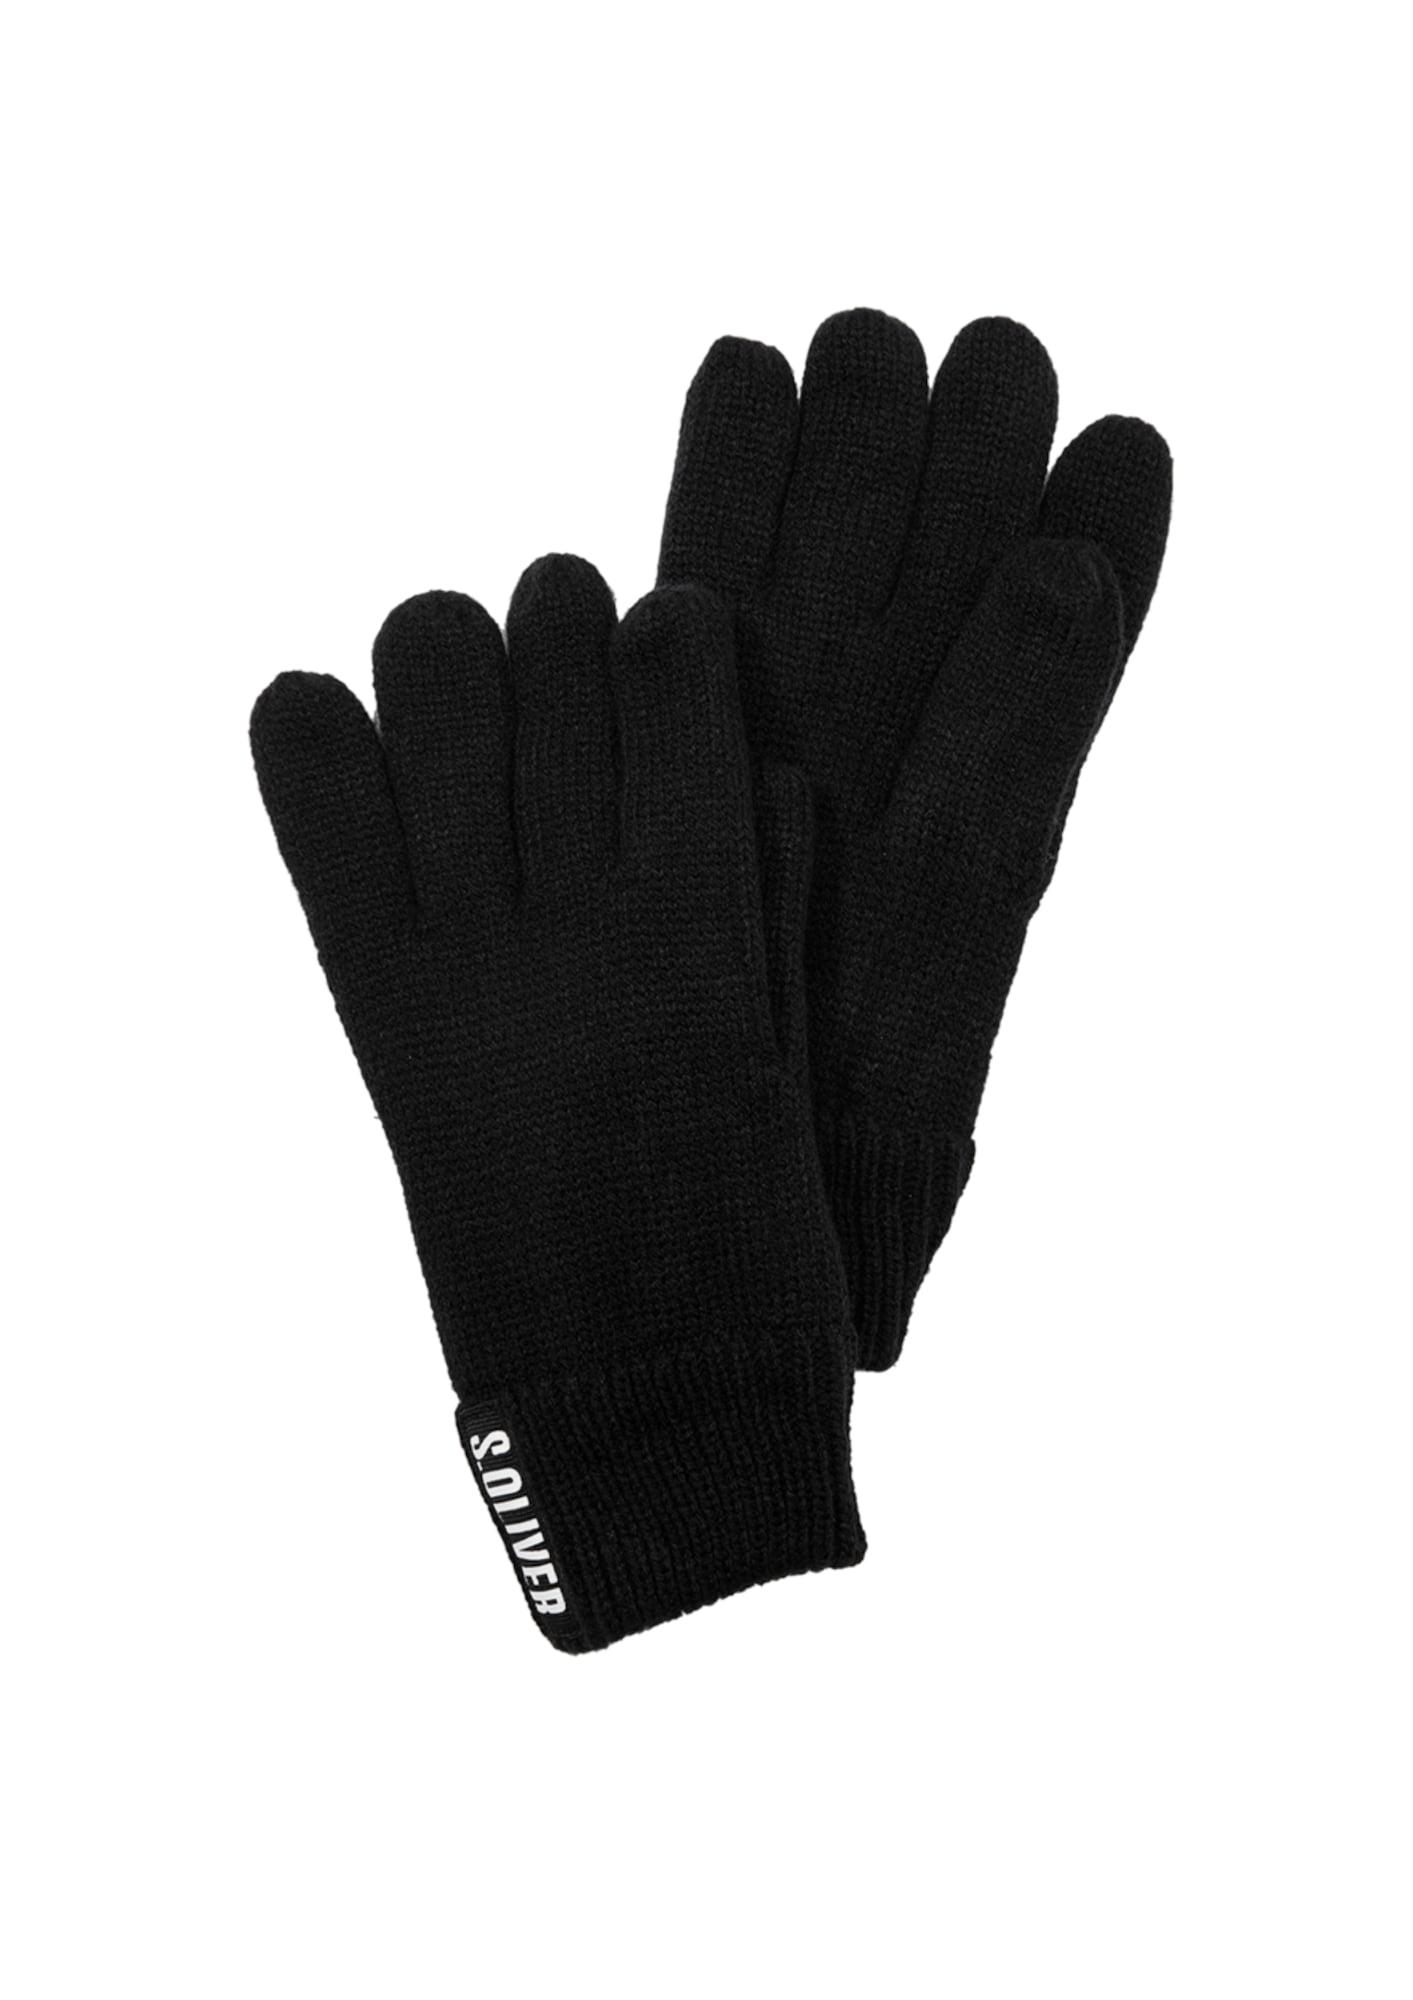 Handschuhe | Accessoires > Handschuhe > Sonstige Handschuhe | S.Oliver RED LABEL